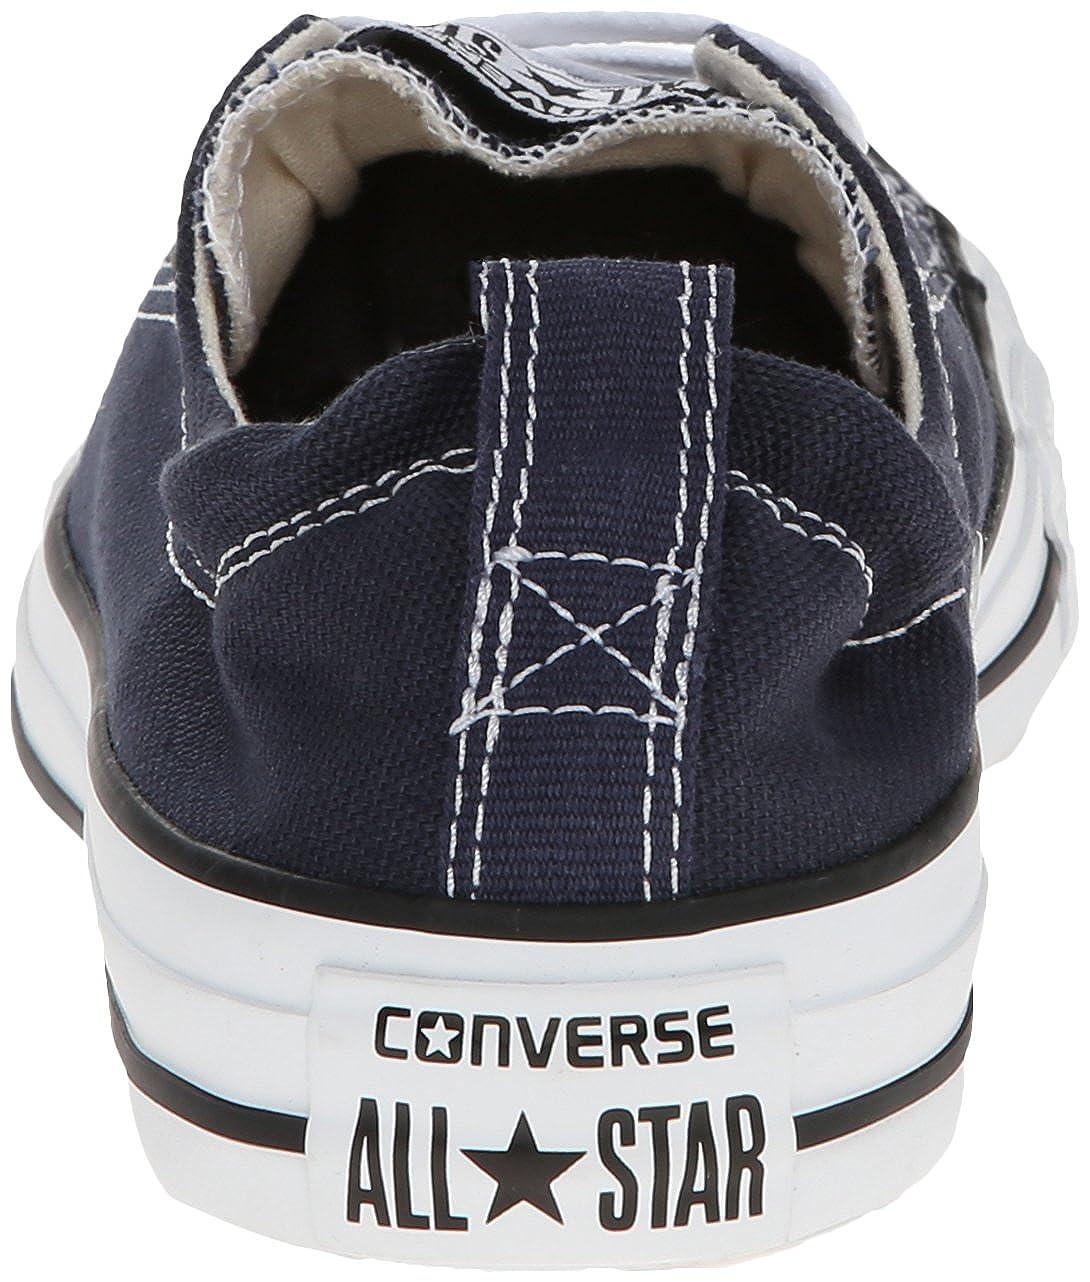 6a7c49061a8 Converse Women s Chuck Taylor All Star Shoreline Low Top Sneaker